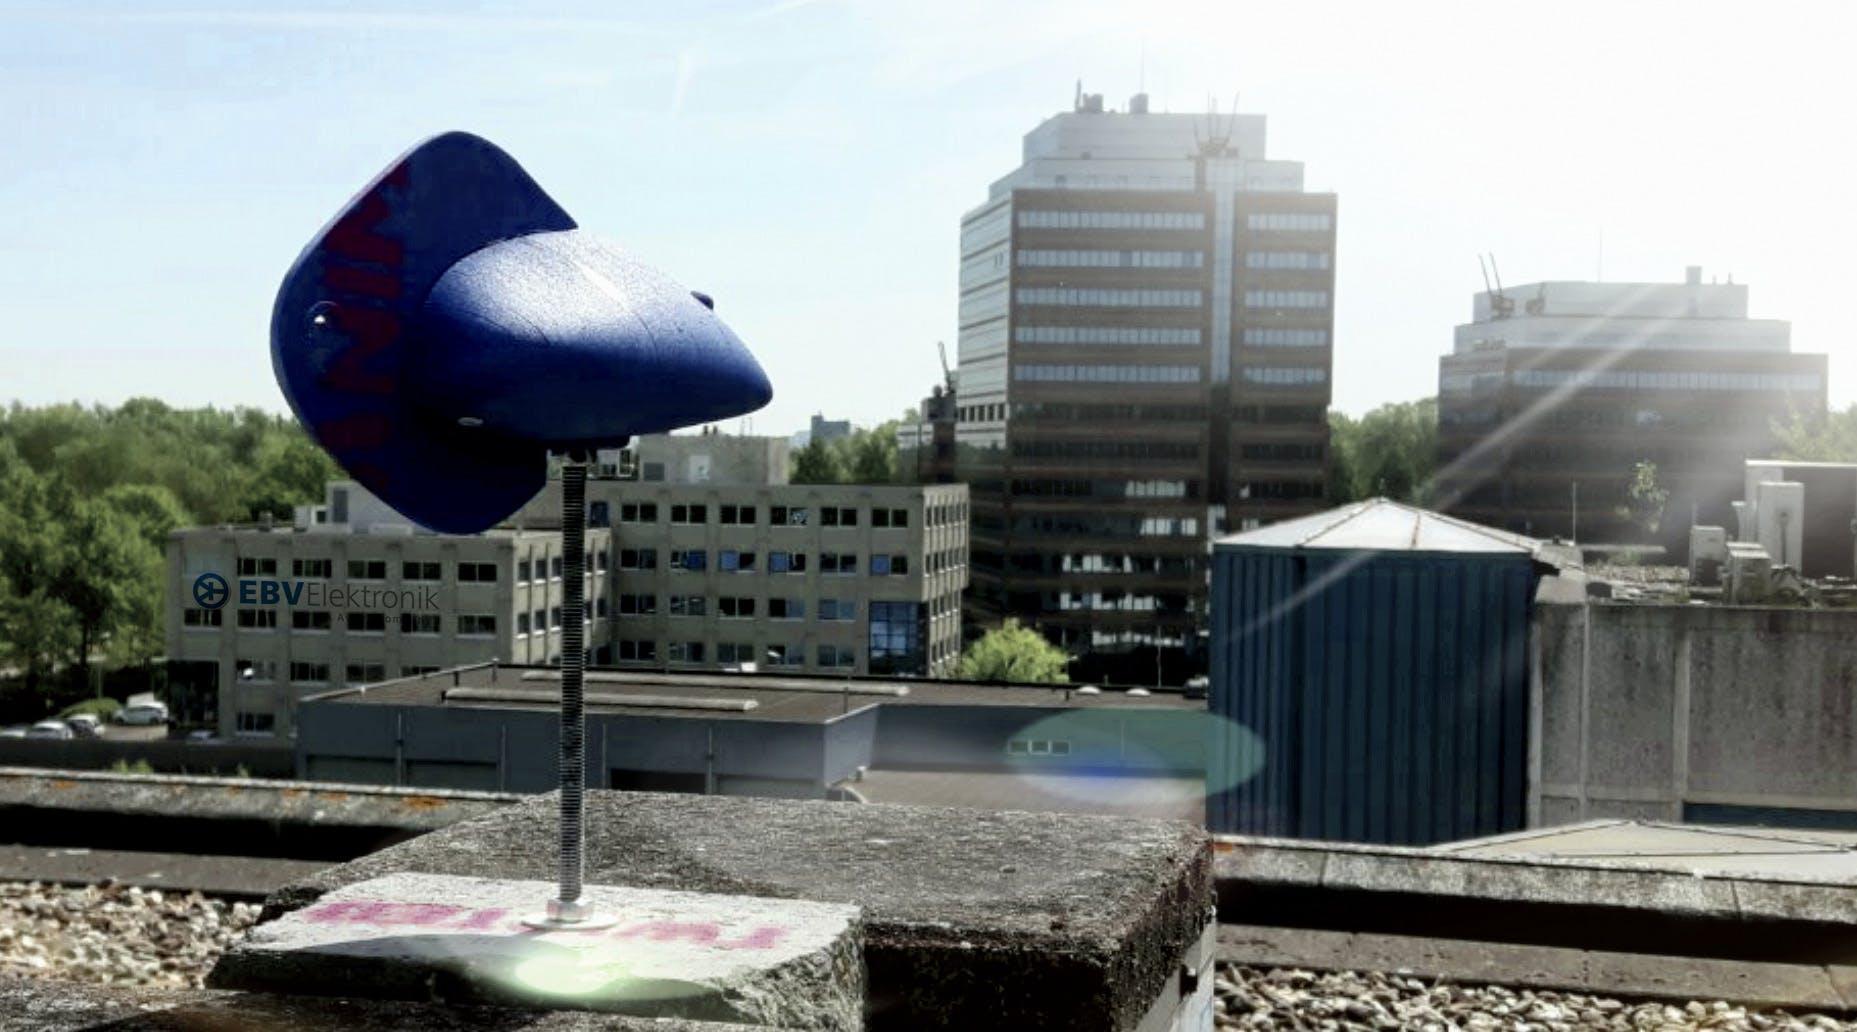 Lora WindVane V2 on top of EBV Building (+36m)